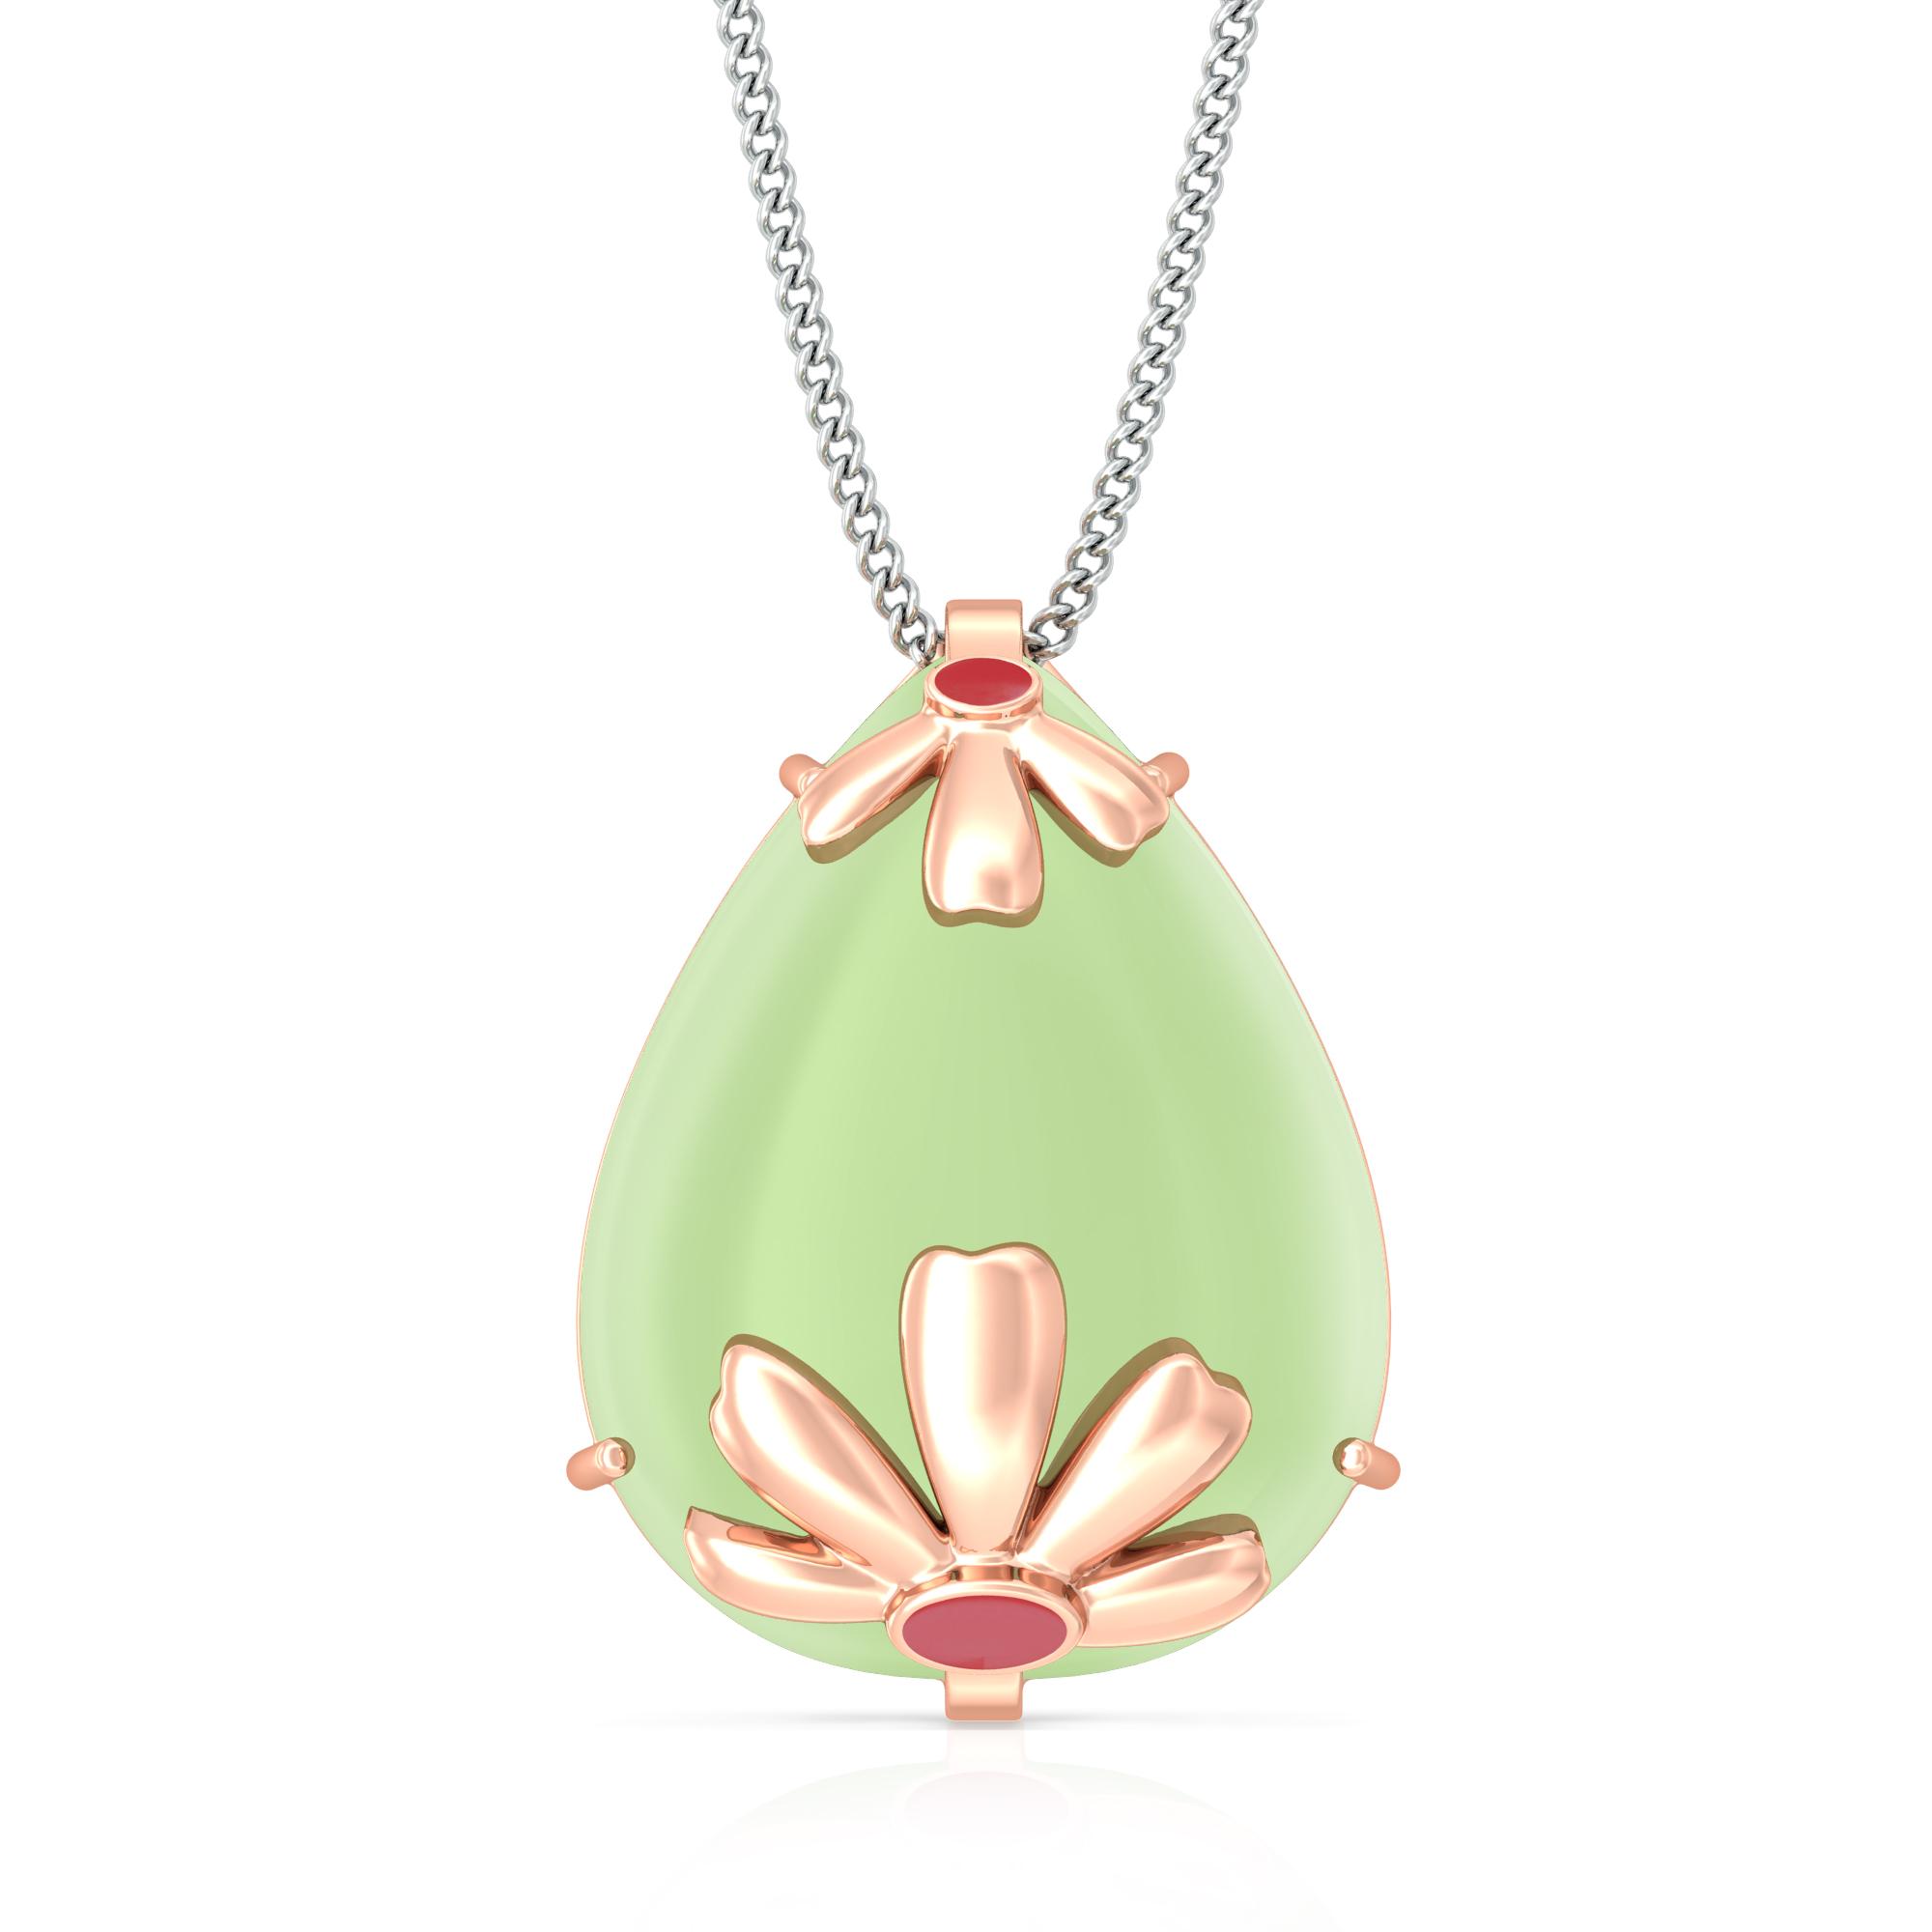 Blossom Lush Gemstone Pendants